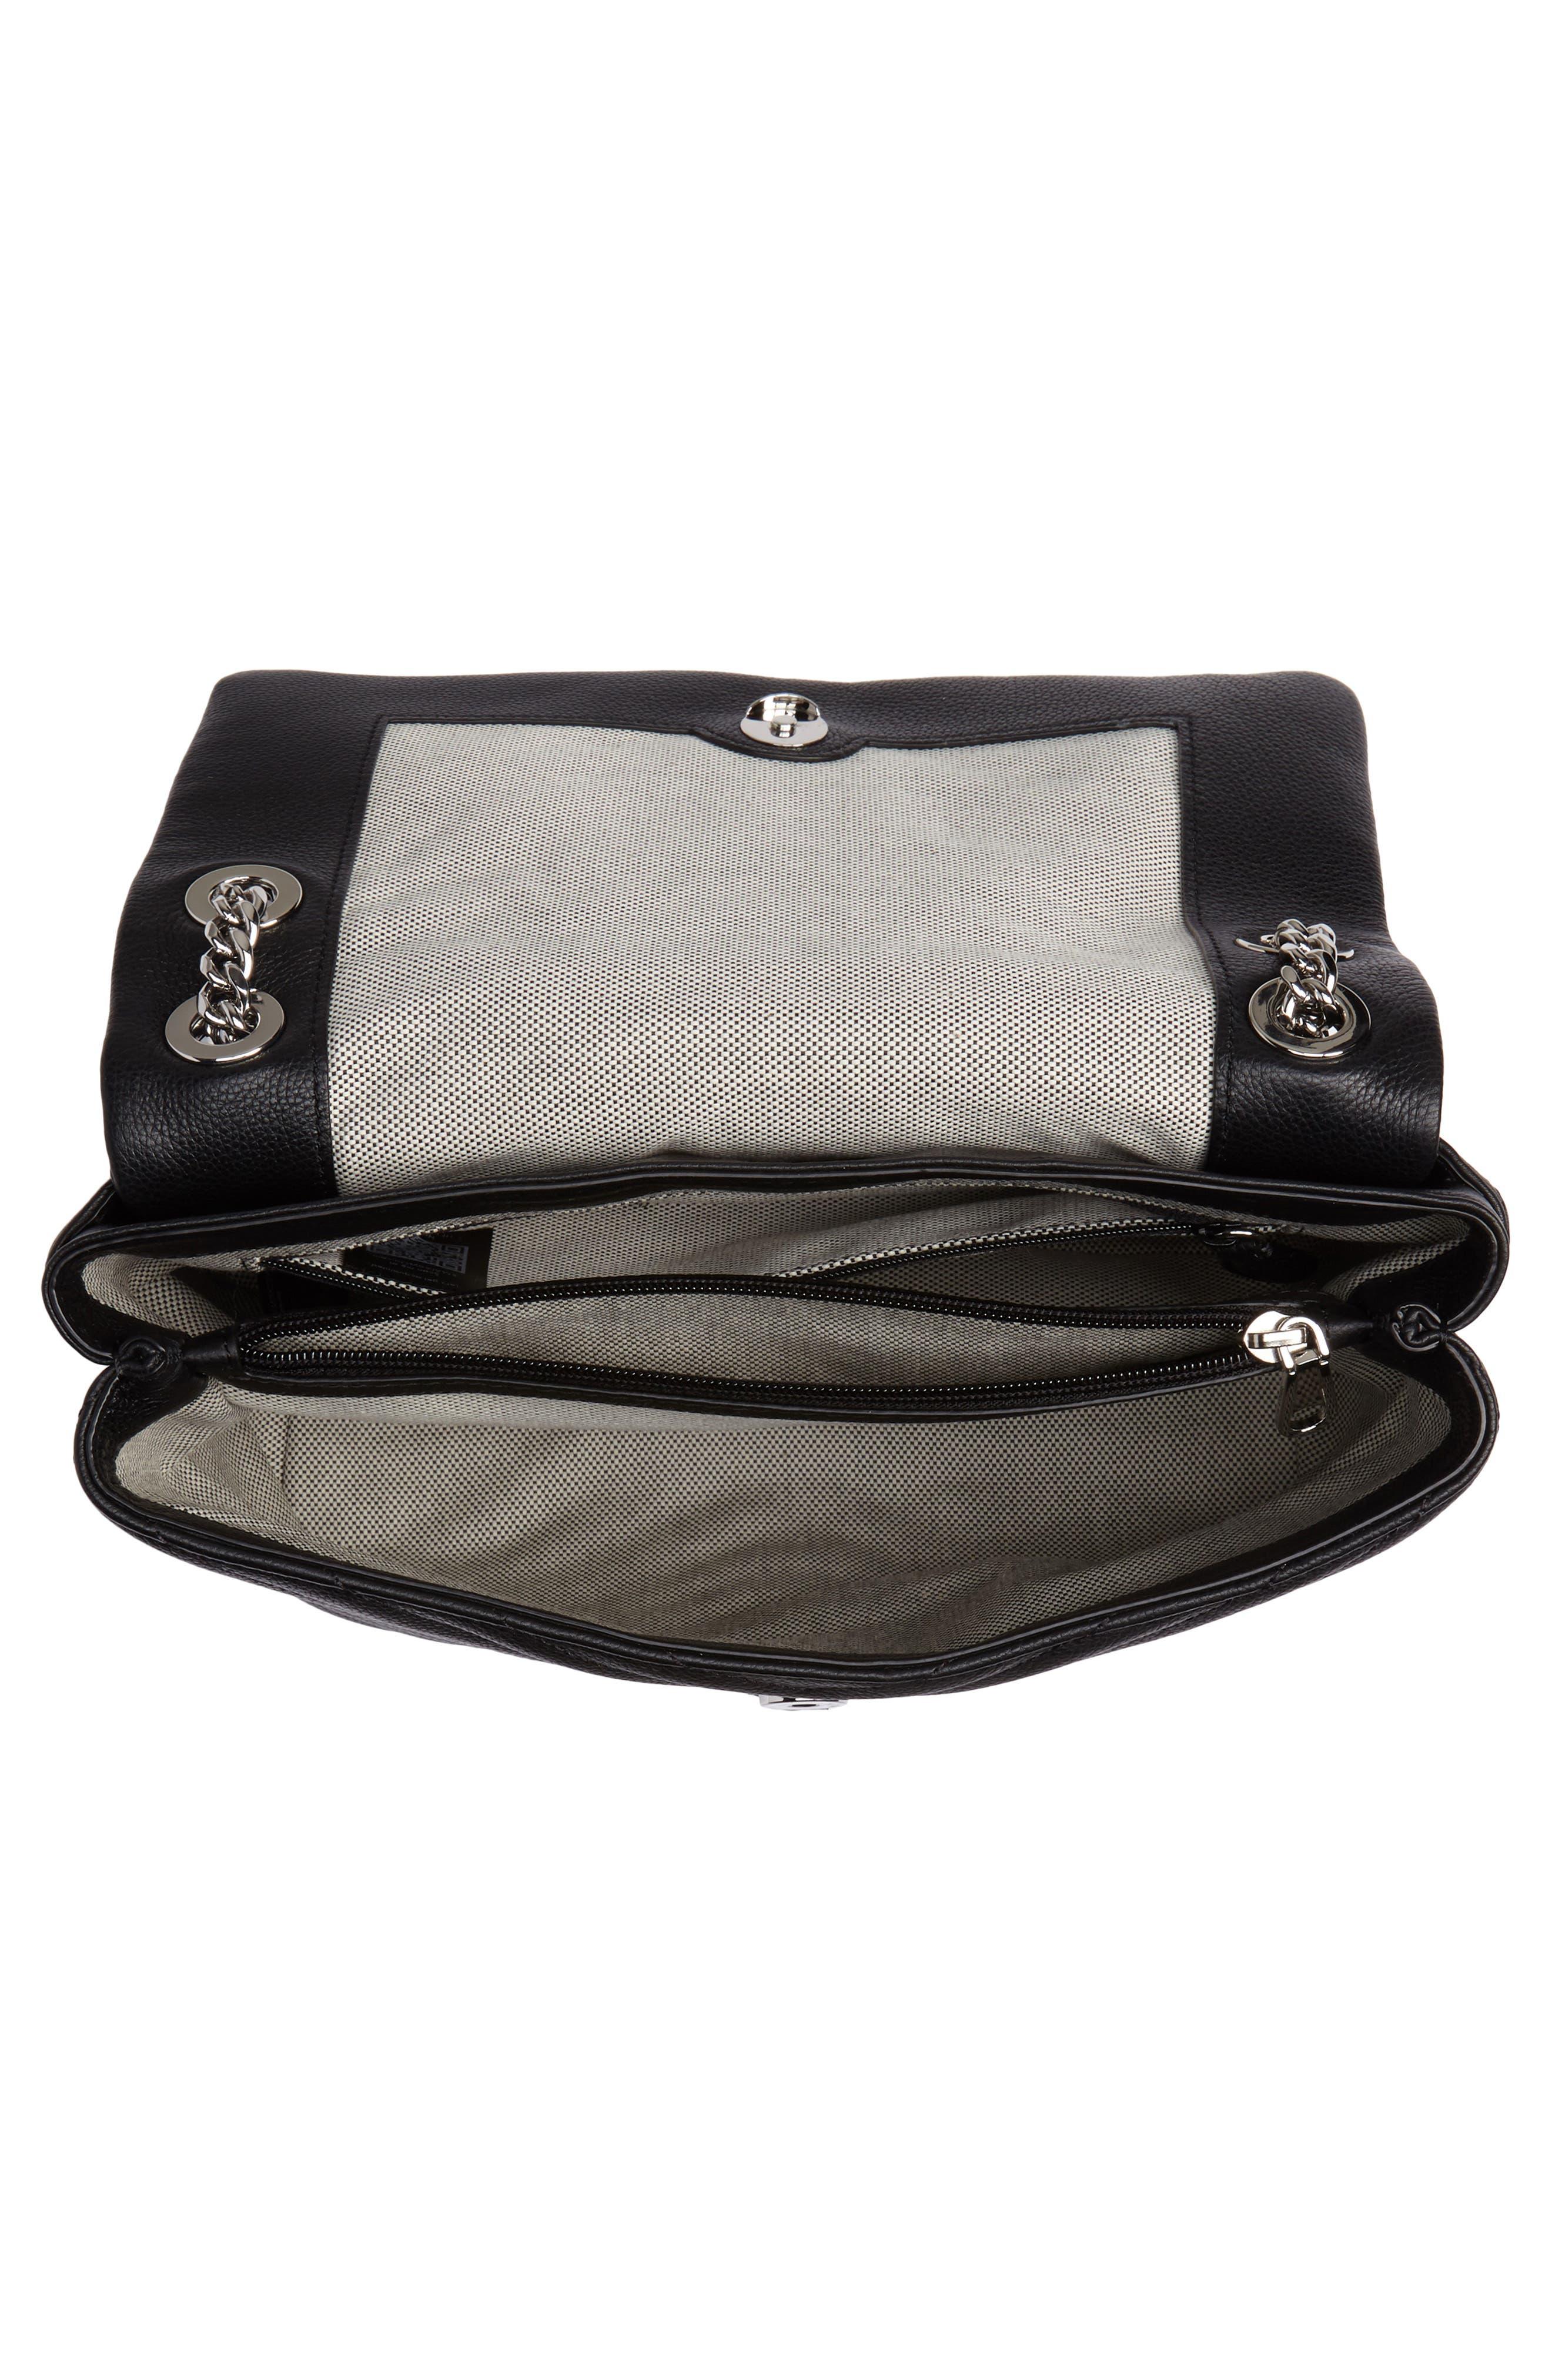 REBECCA MINKOFF, Edie Flap Quilted Leather Shoulder Bag, Alternate thumbnail 5, color, BLACK